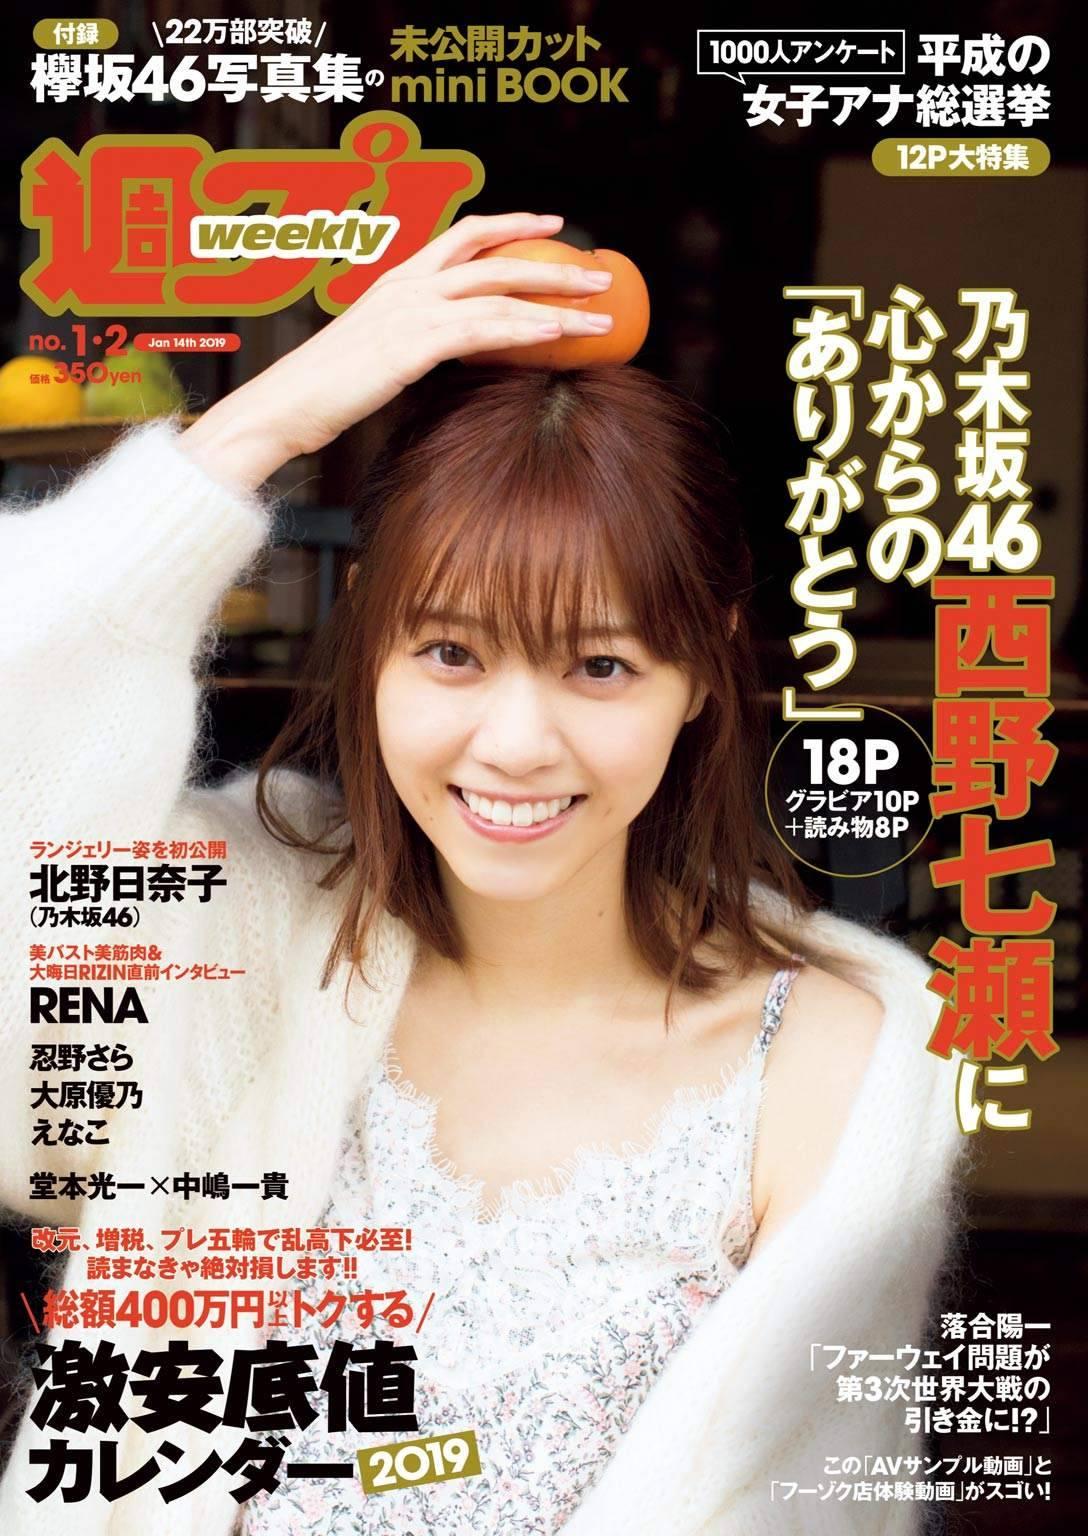 NNishino WPB 190114 01.jpg